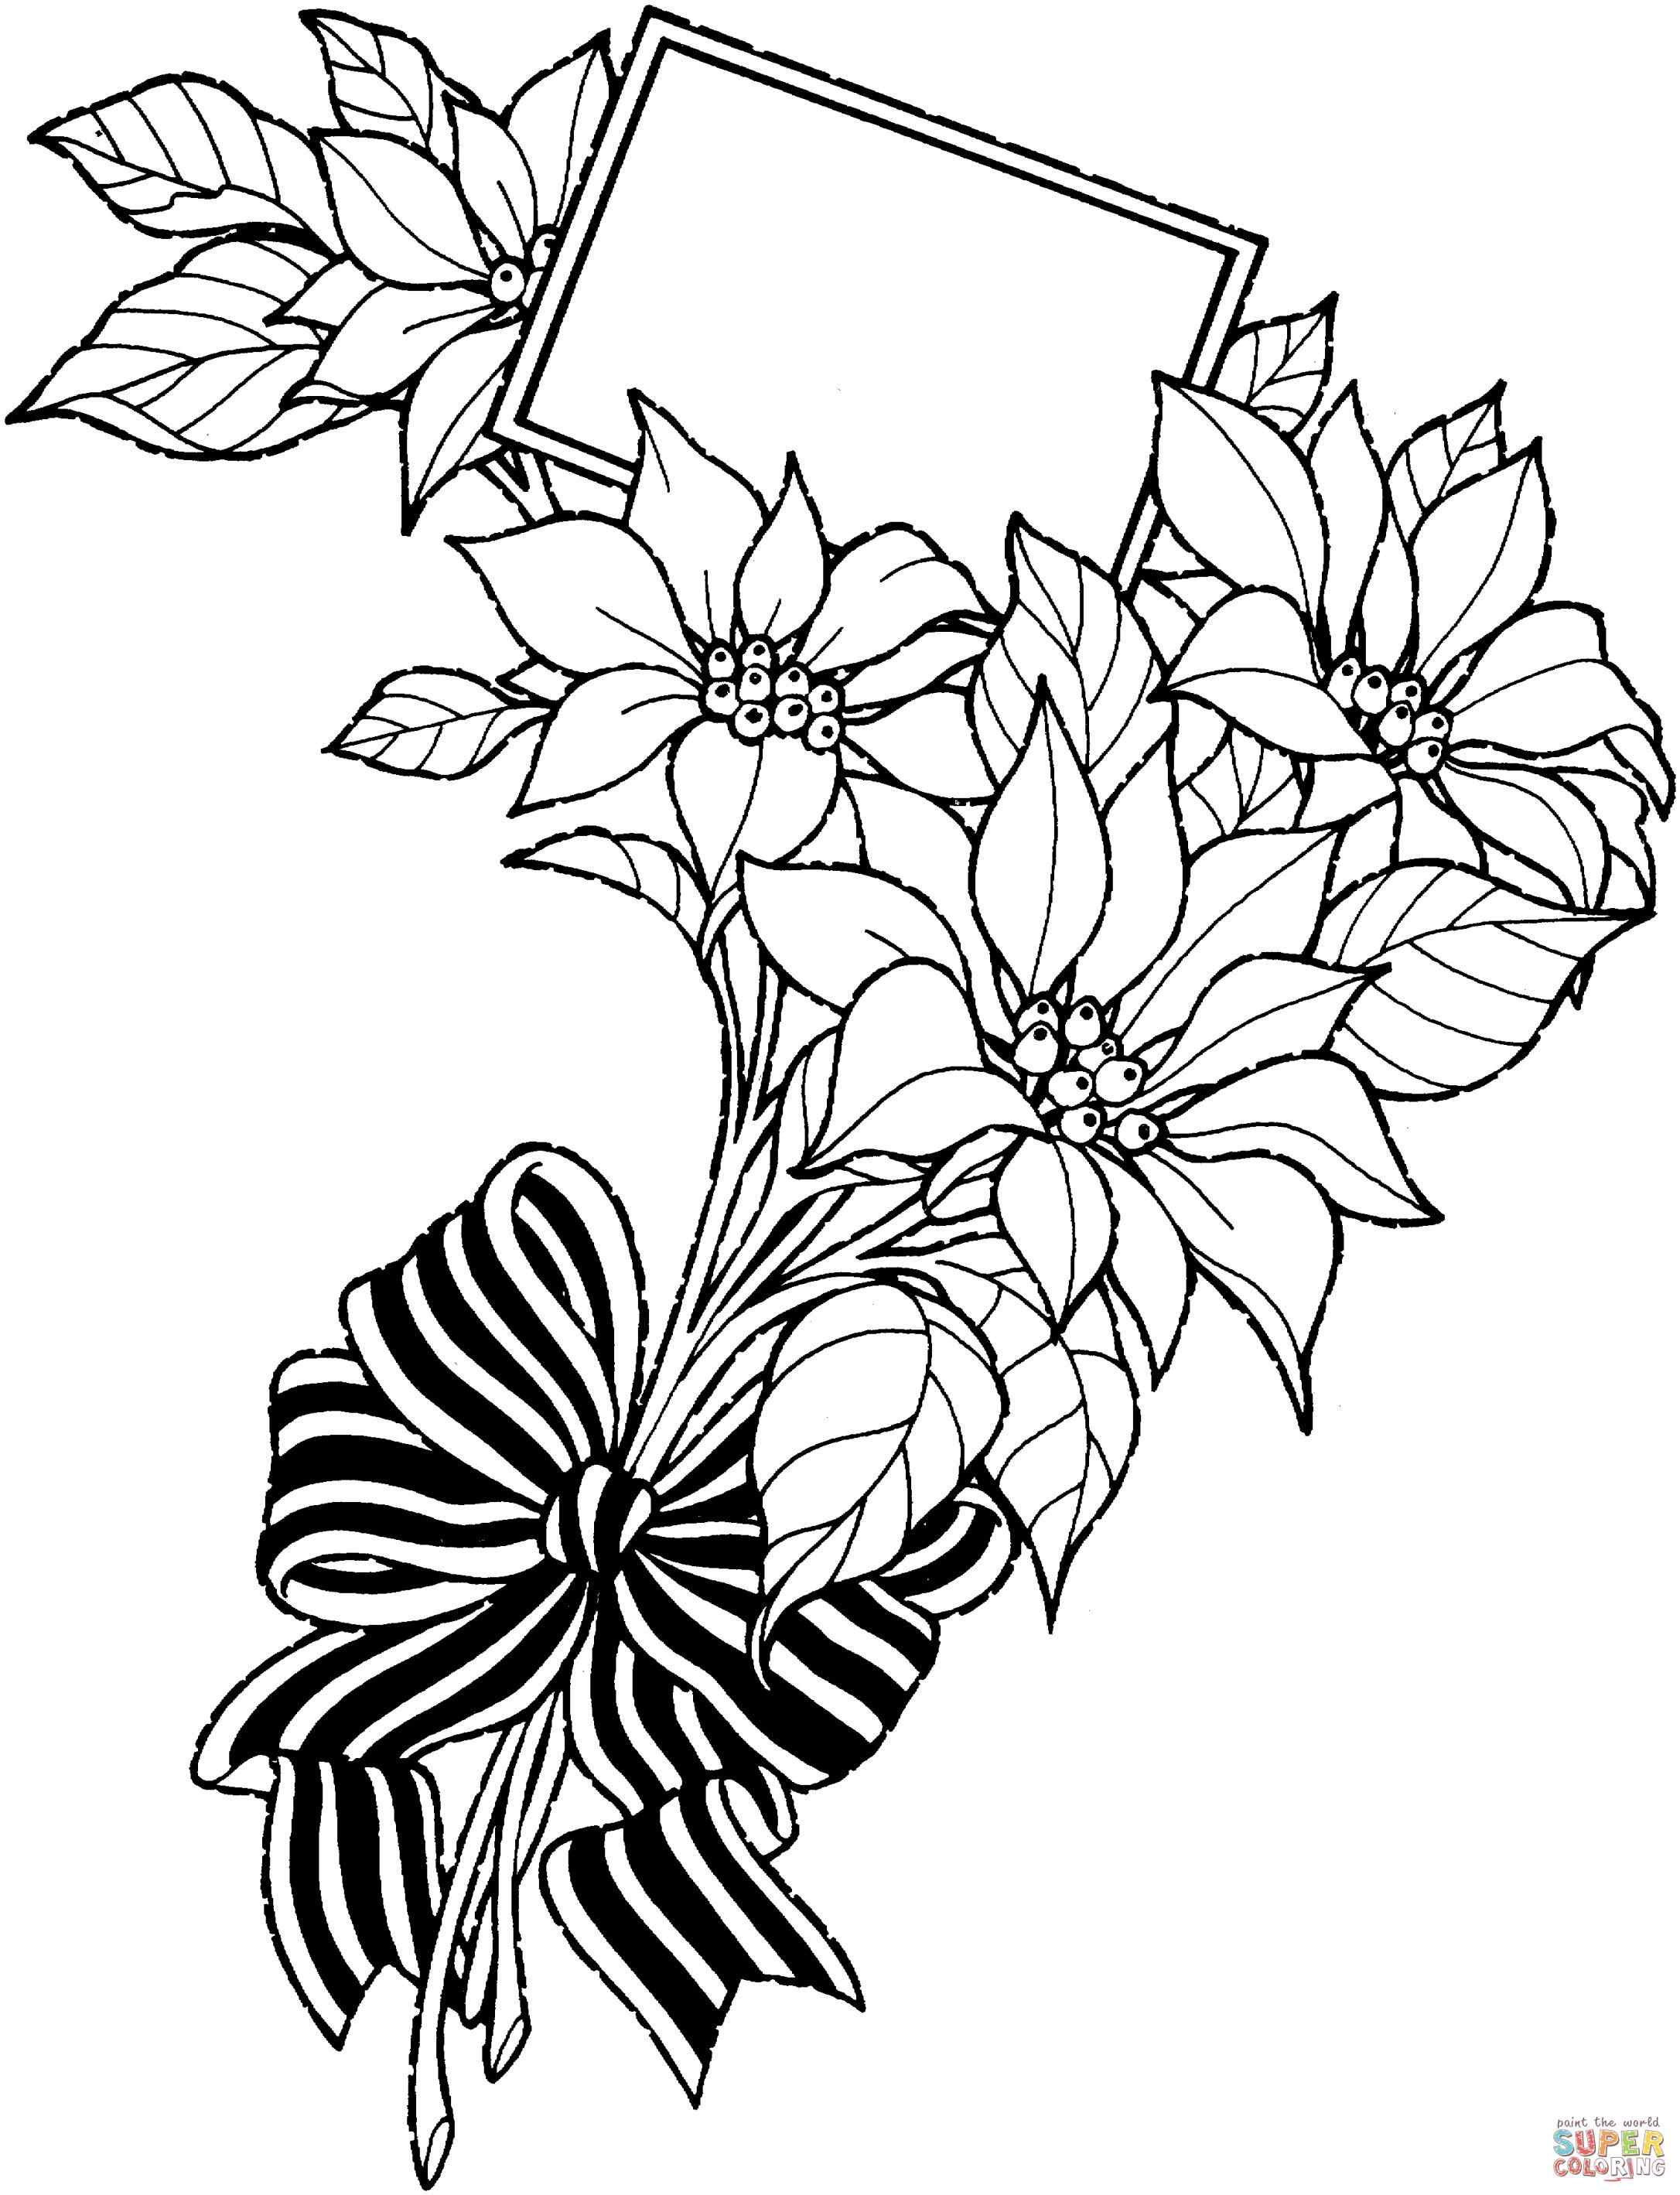 2172x2838 Panda Free Vintage Clip Art Aster Vintage Bouquet Of Roses Clipart